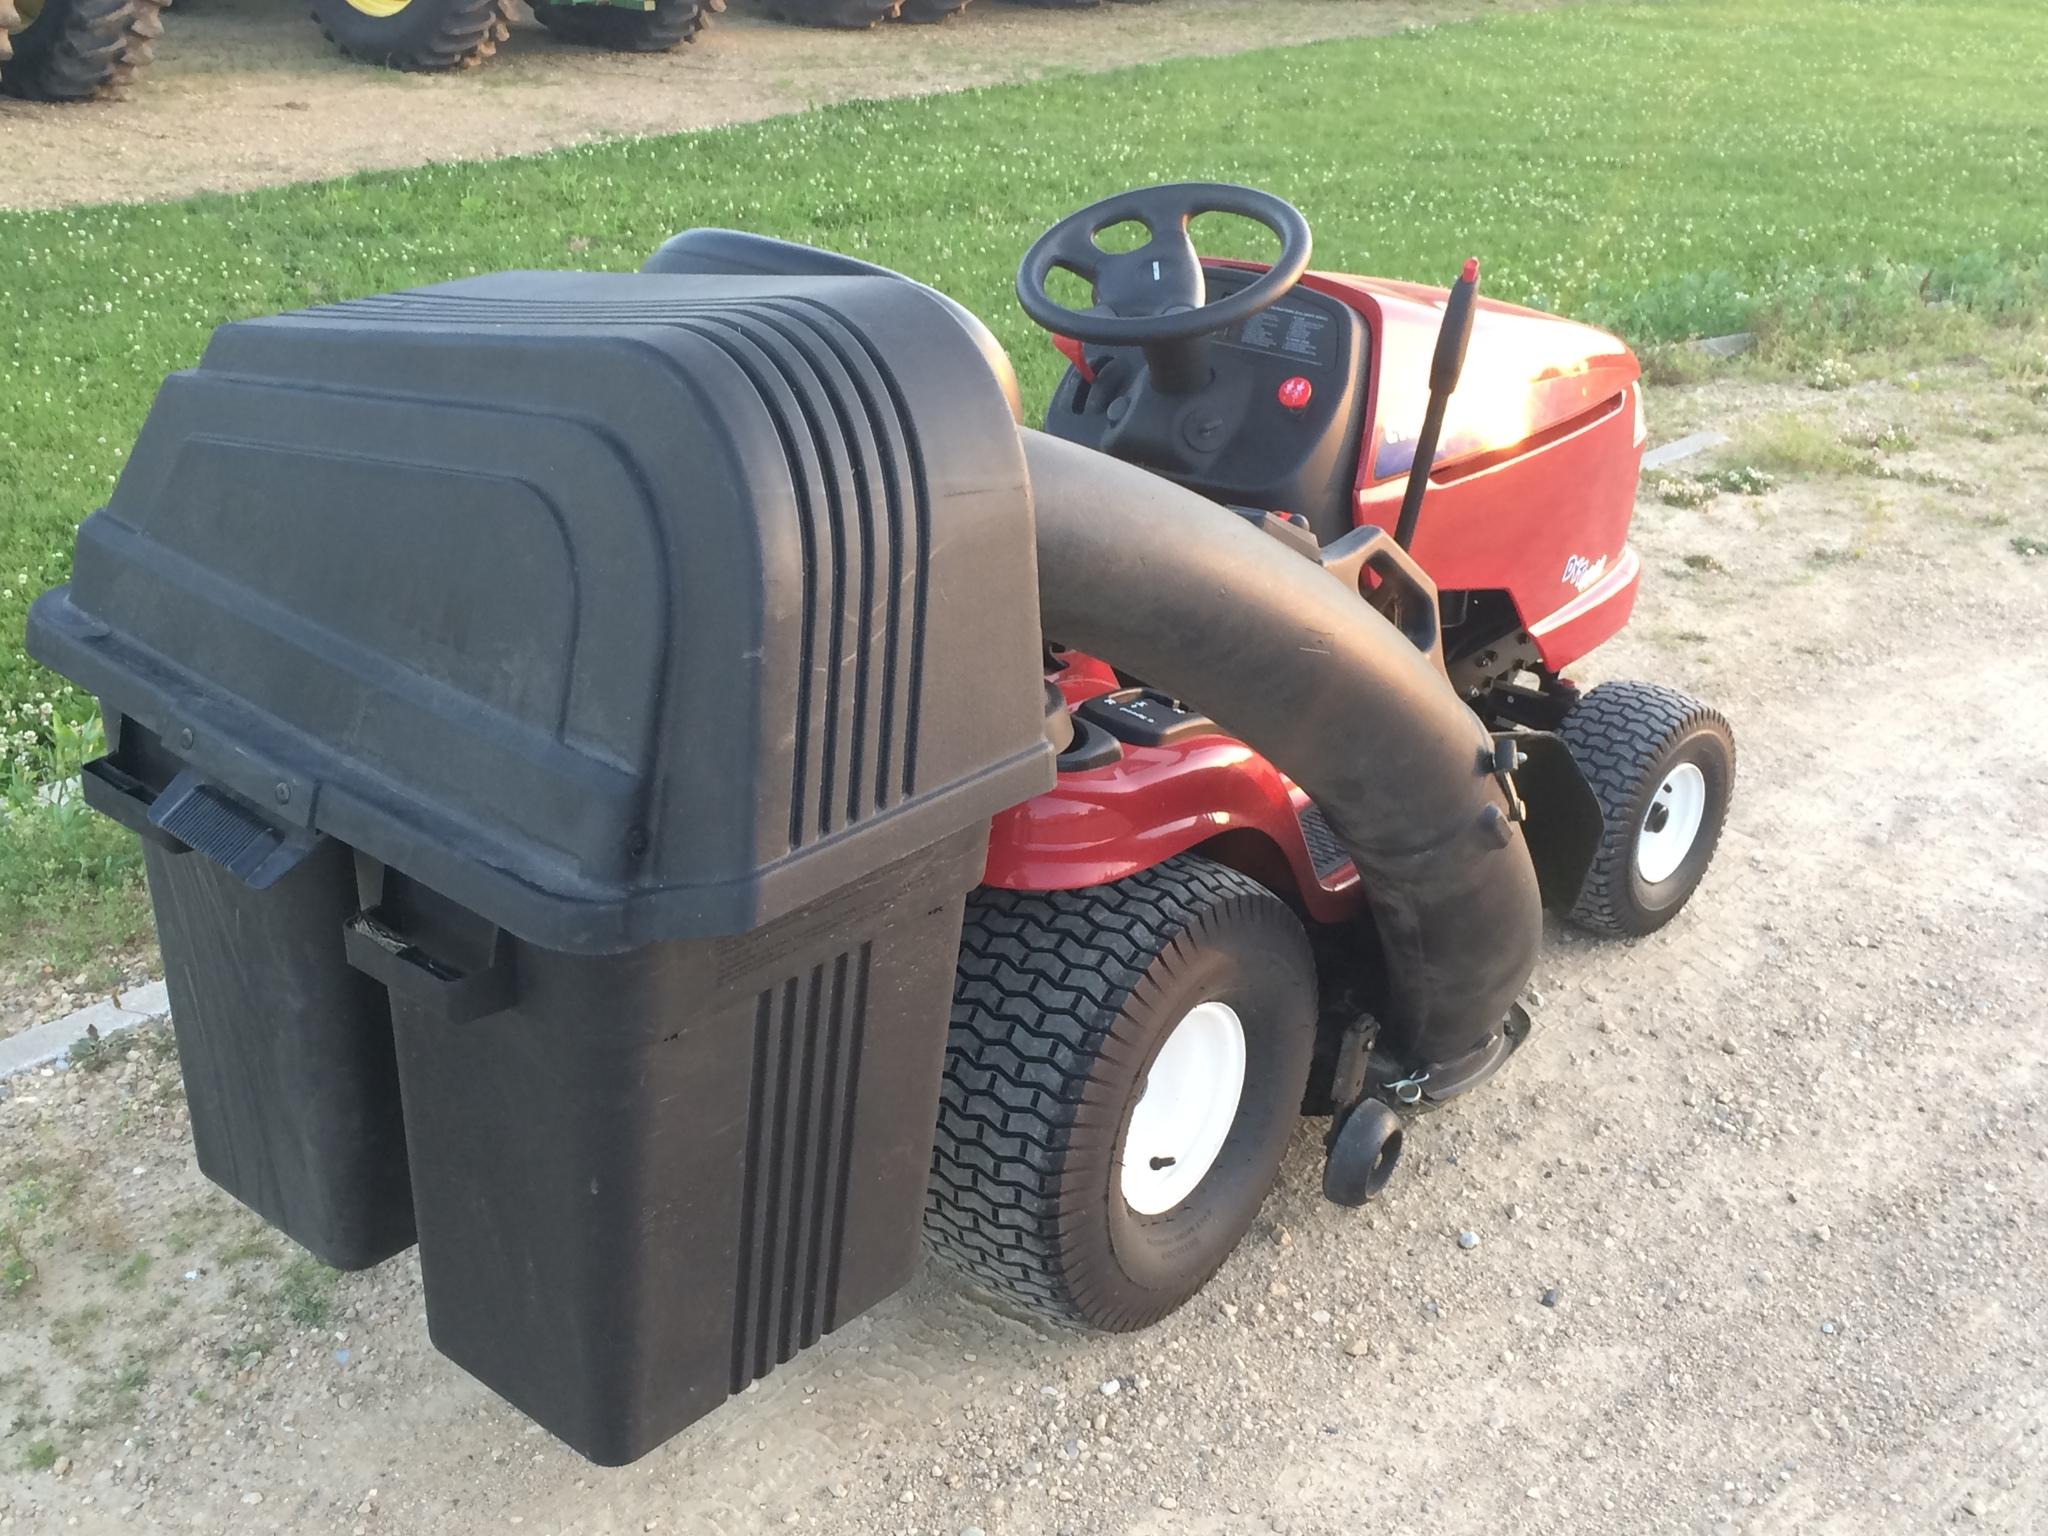 Craftsman Dyt 4000 Grass Catcher : Craftsman dyt lawn garden tractors for sale